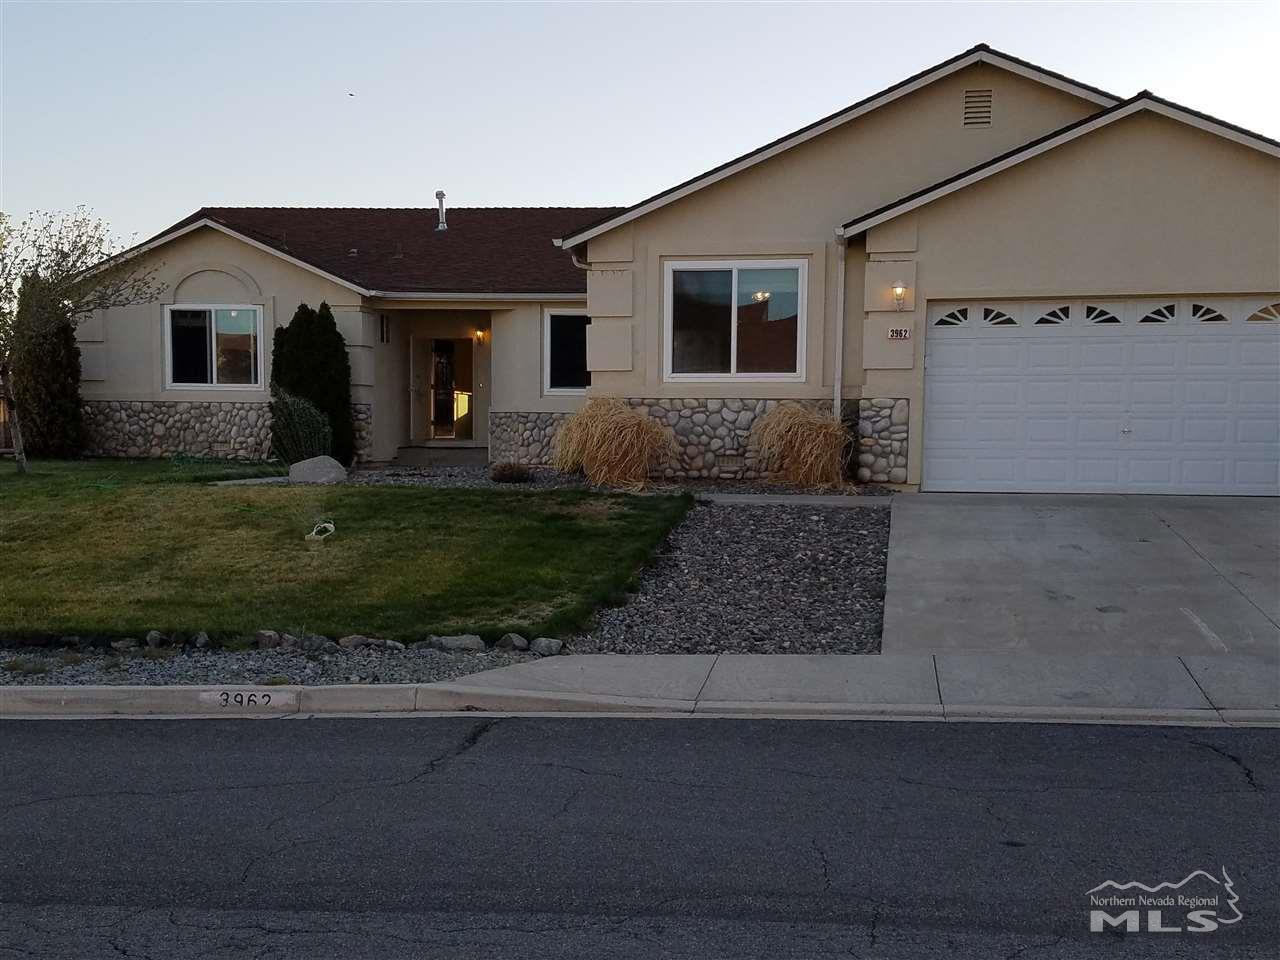 Image for 3962 Kettle Rock, Reno, NV 89506